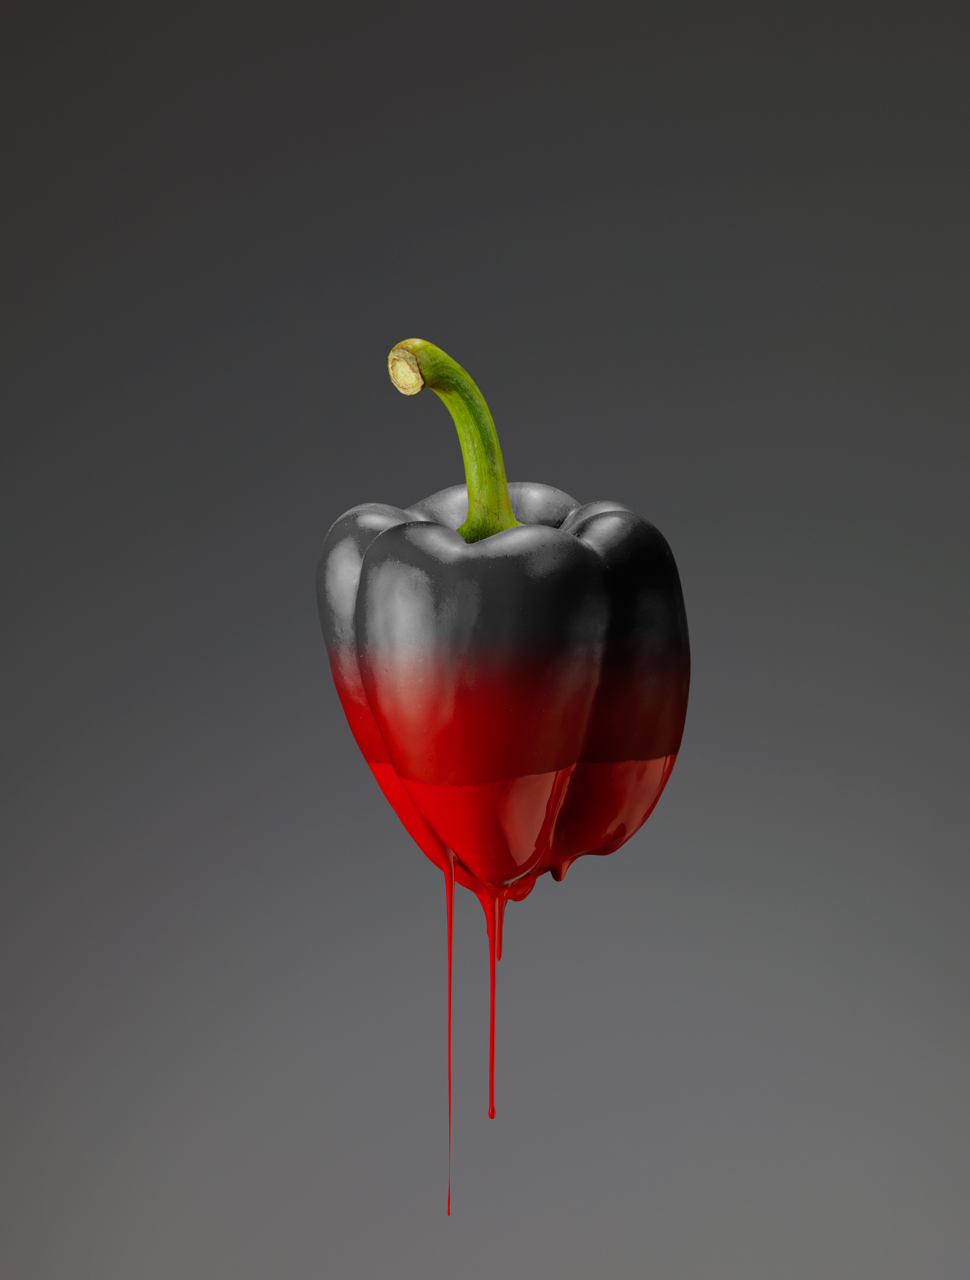 giorgio-cravero-colors-series-2.jpg